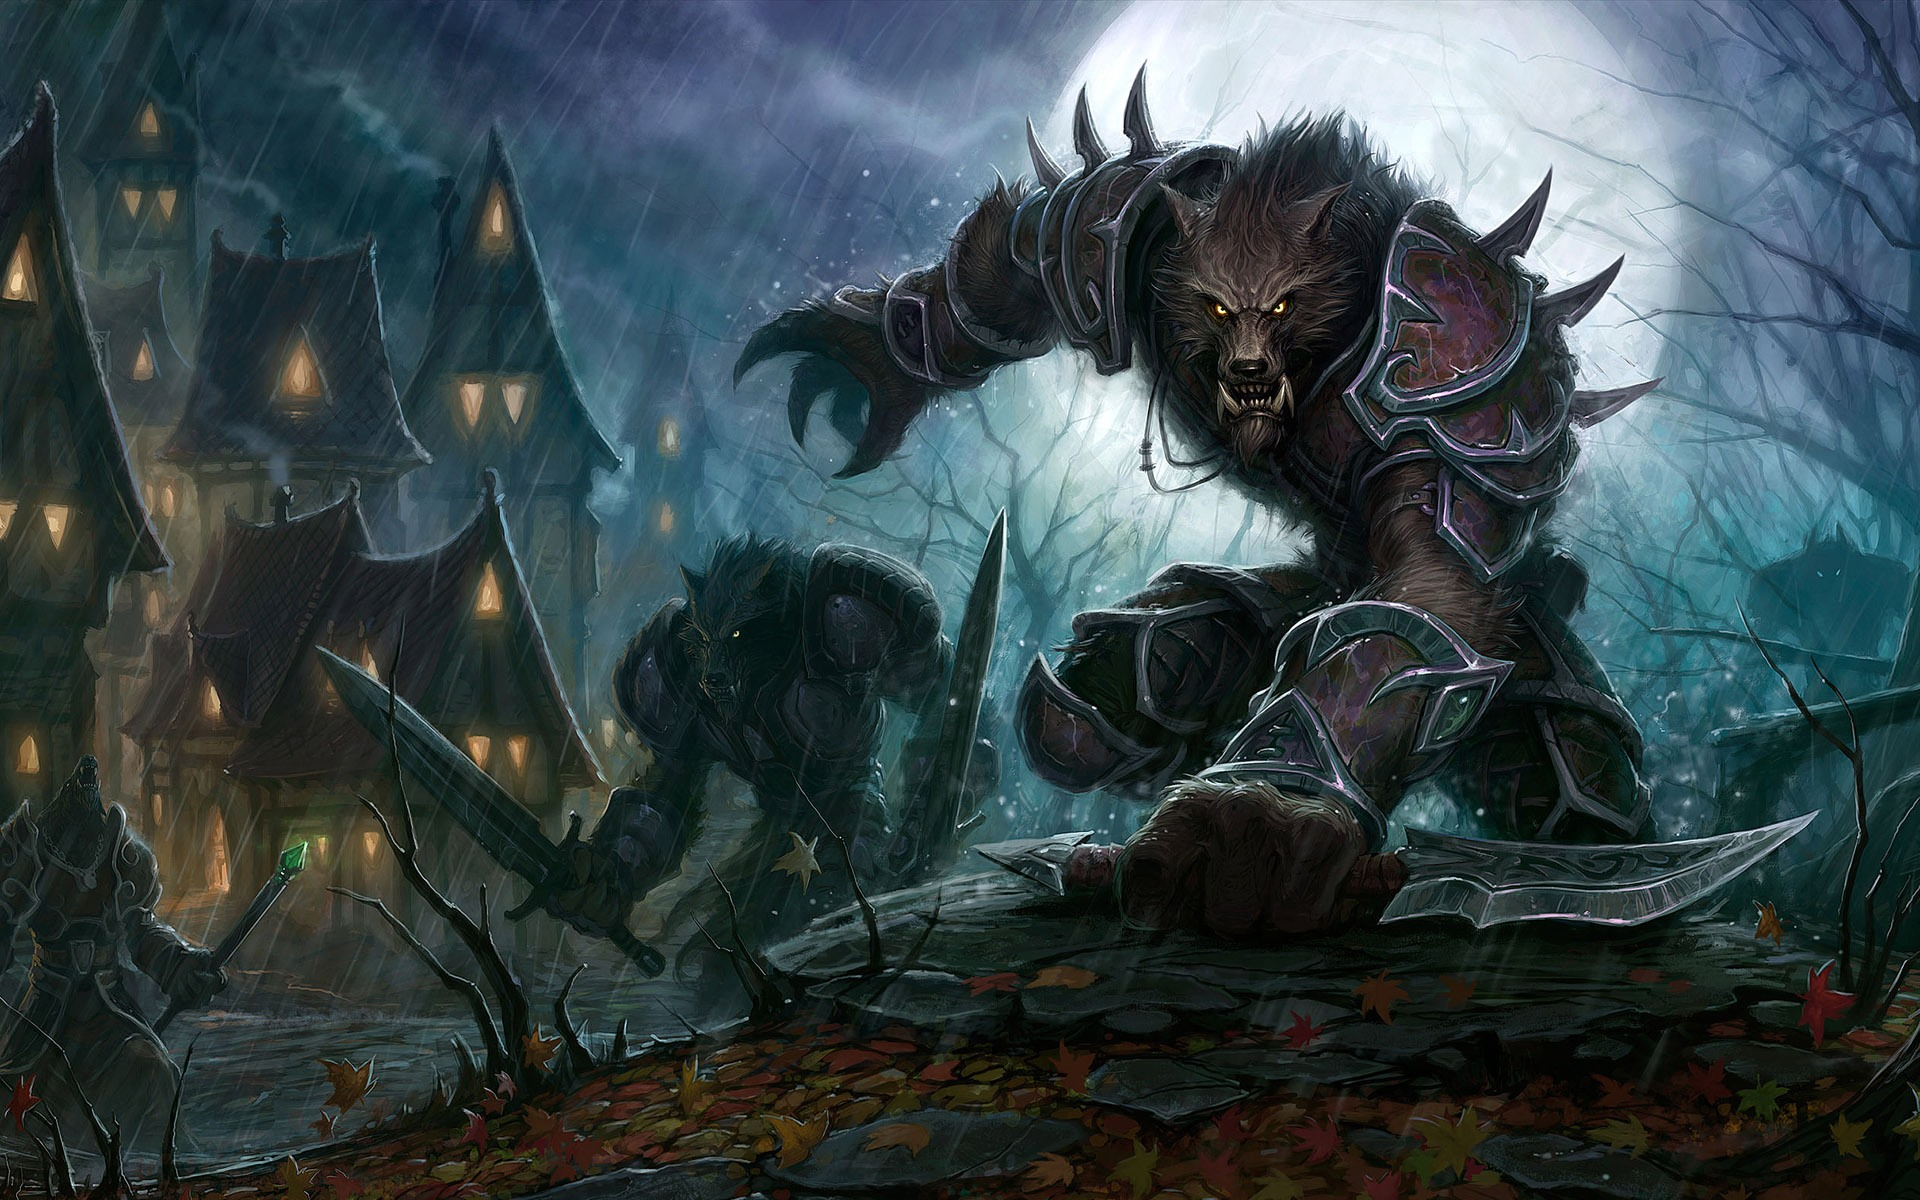 ... Elf Race image williamhill apuestas online betting william hill - World of AklesH Mod for Warcraft III: Frozen Throne